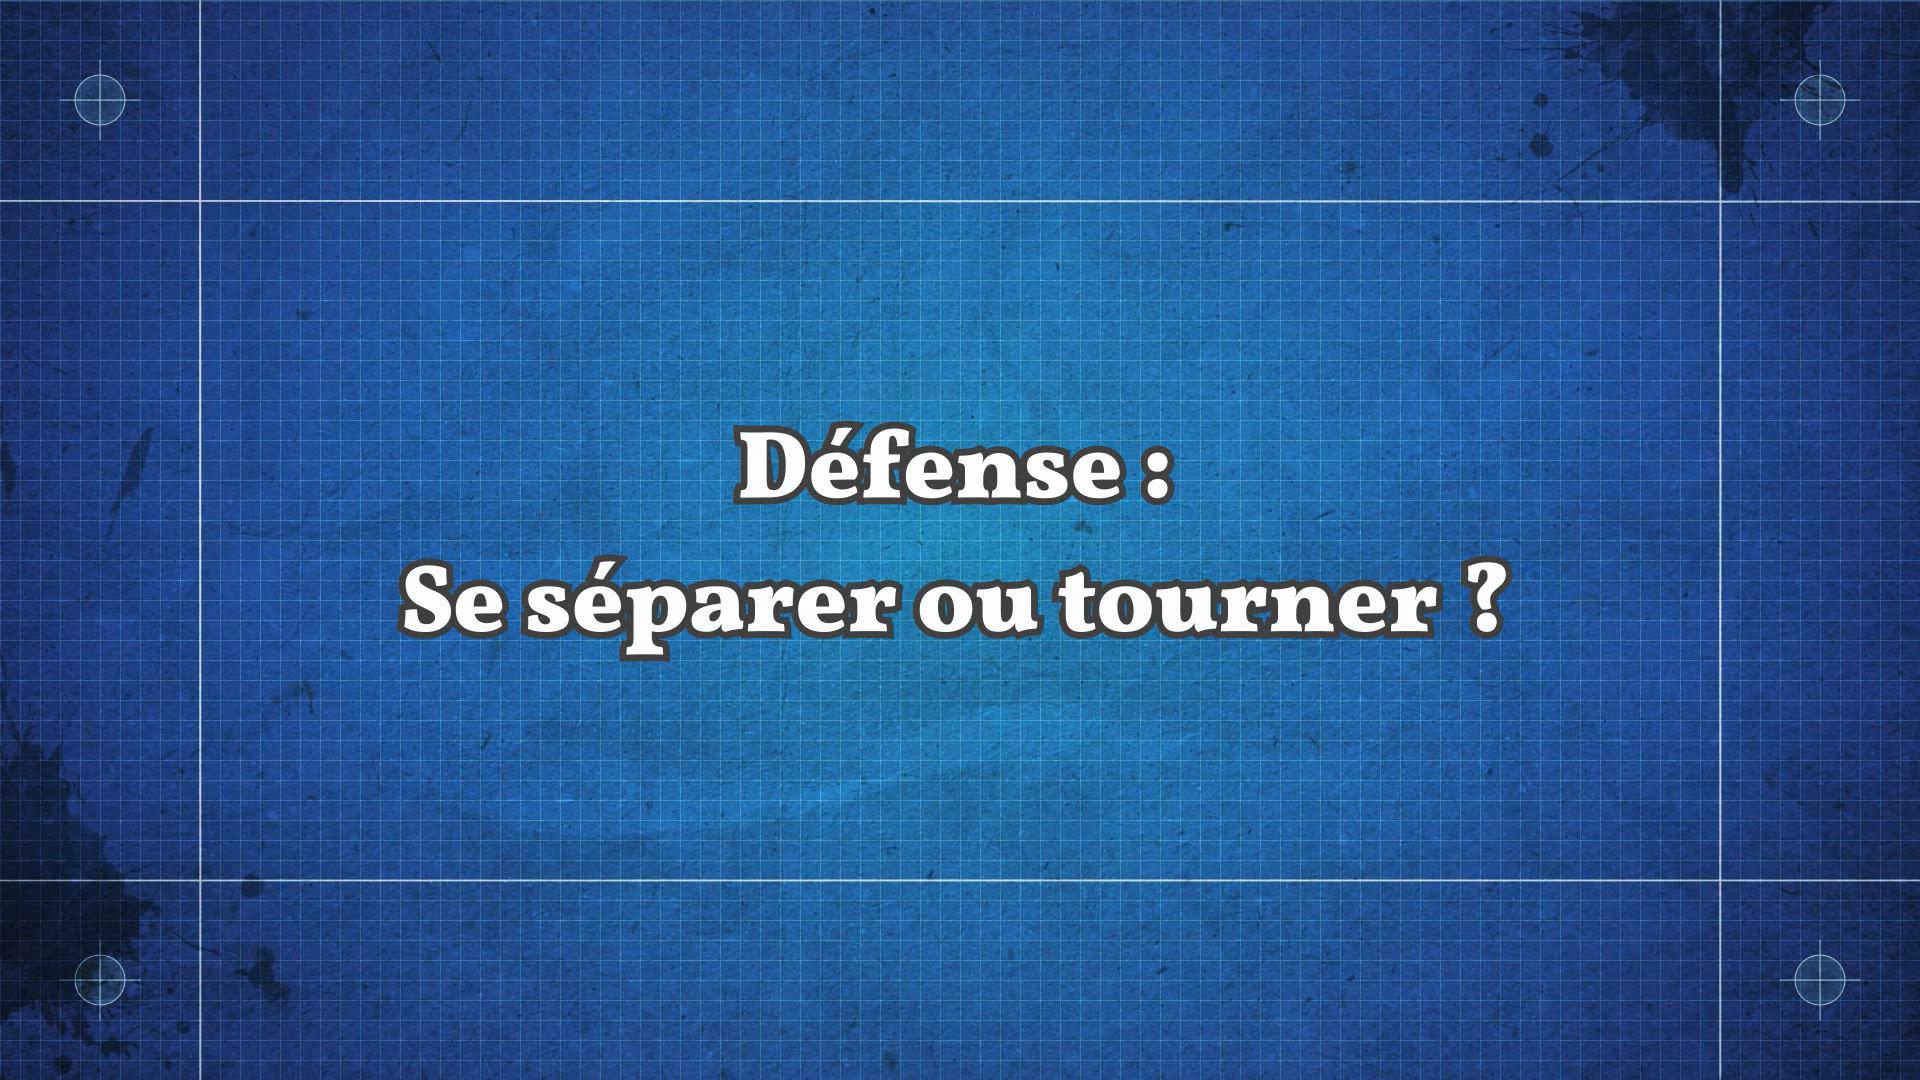 En défense : Tourner ou se séparer ?